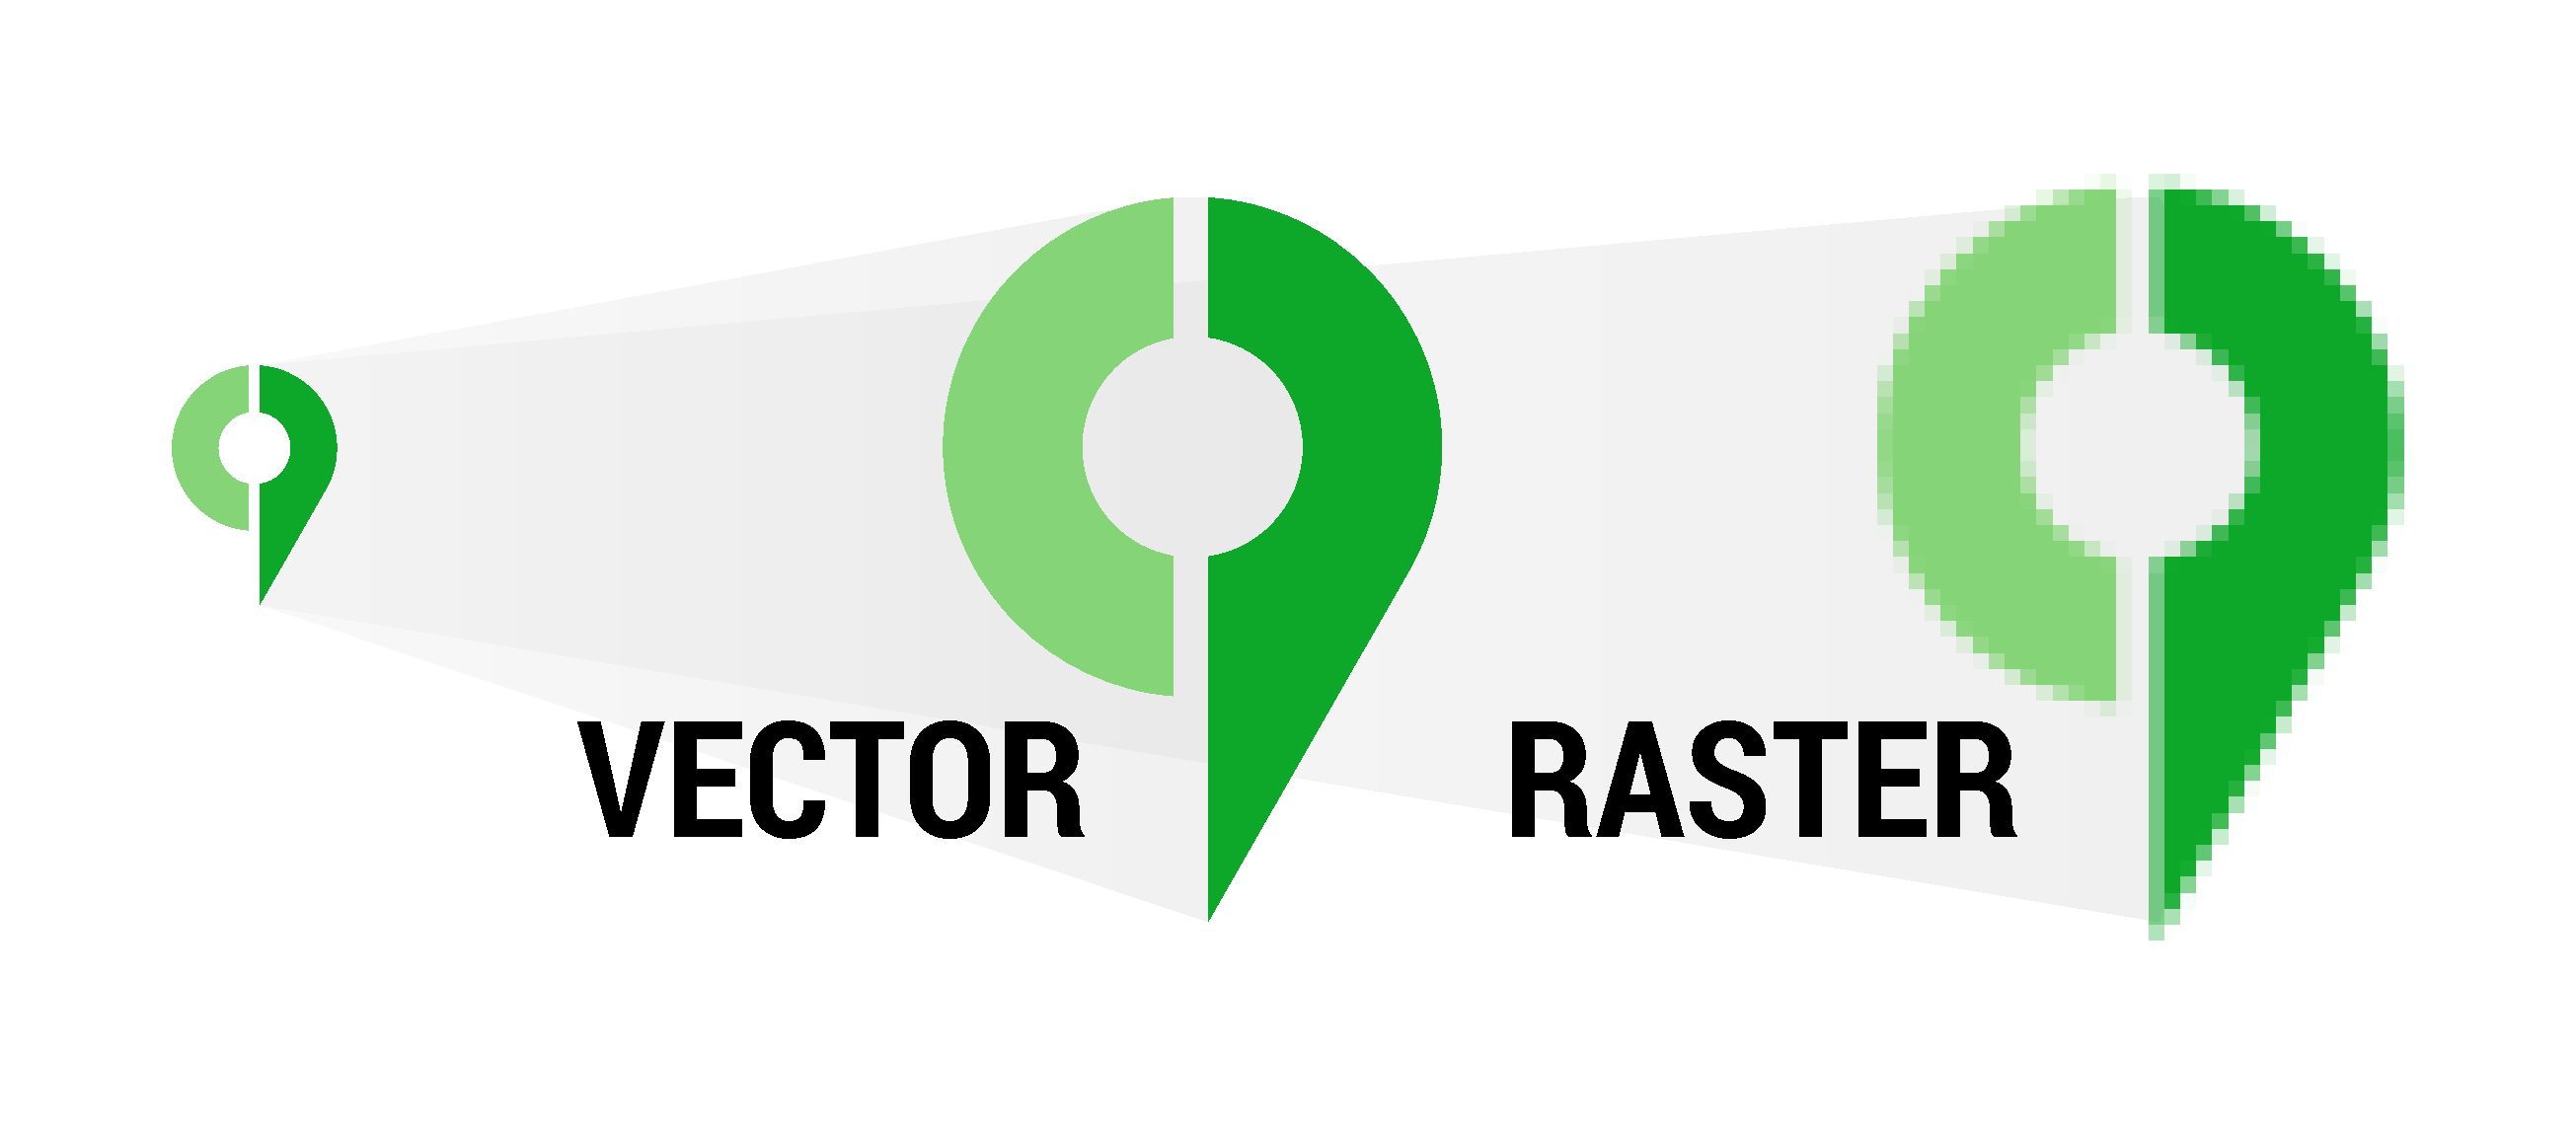 2610x1146 Vector Vs Raster Choosing The Right Image Format Cityplanner Guide